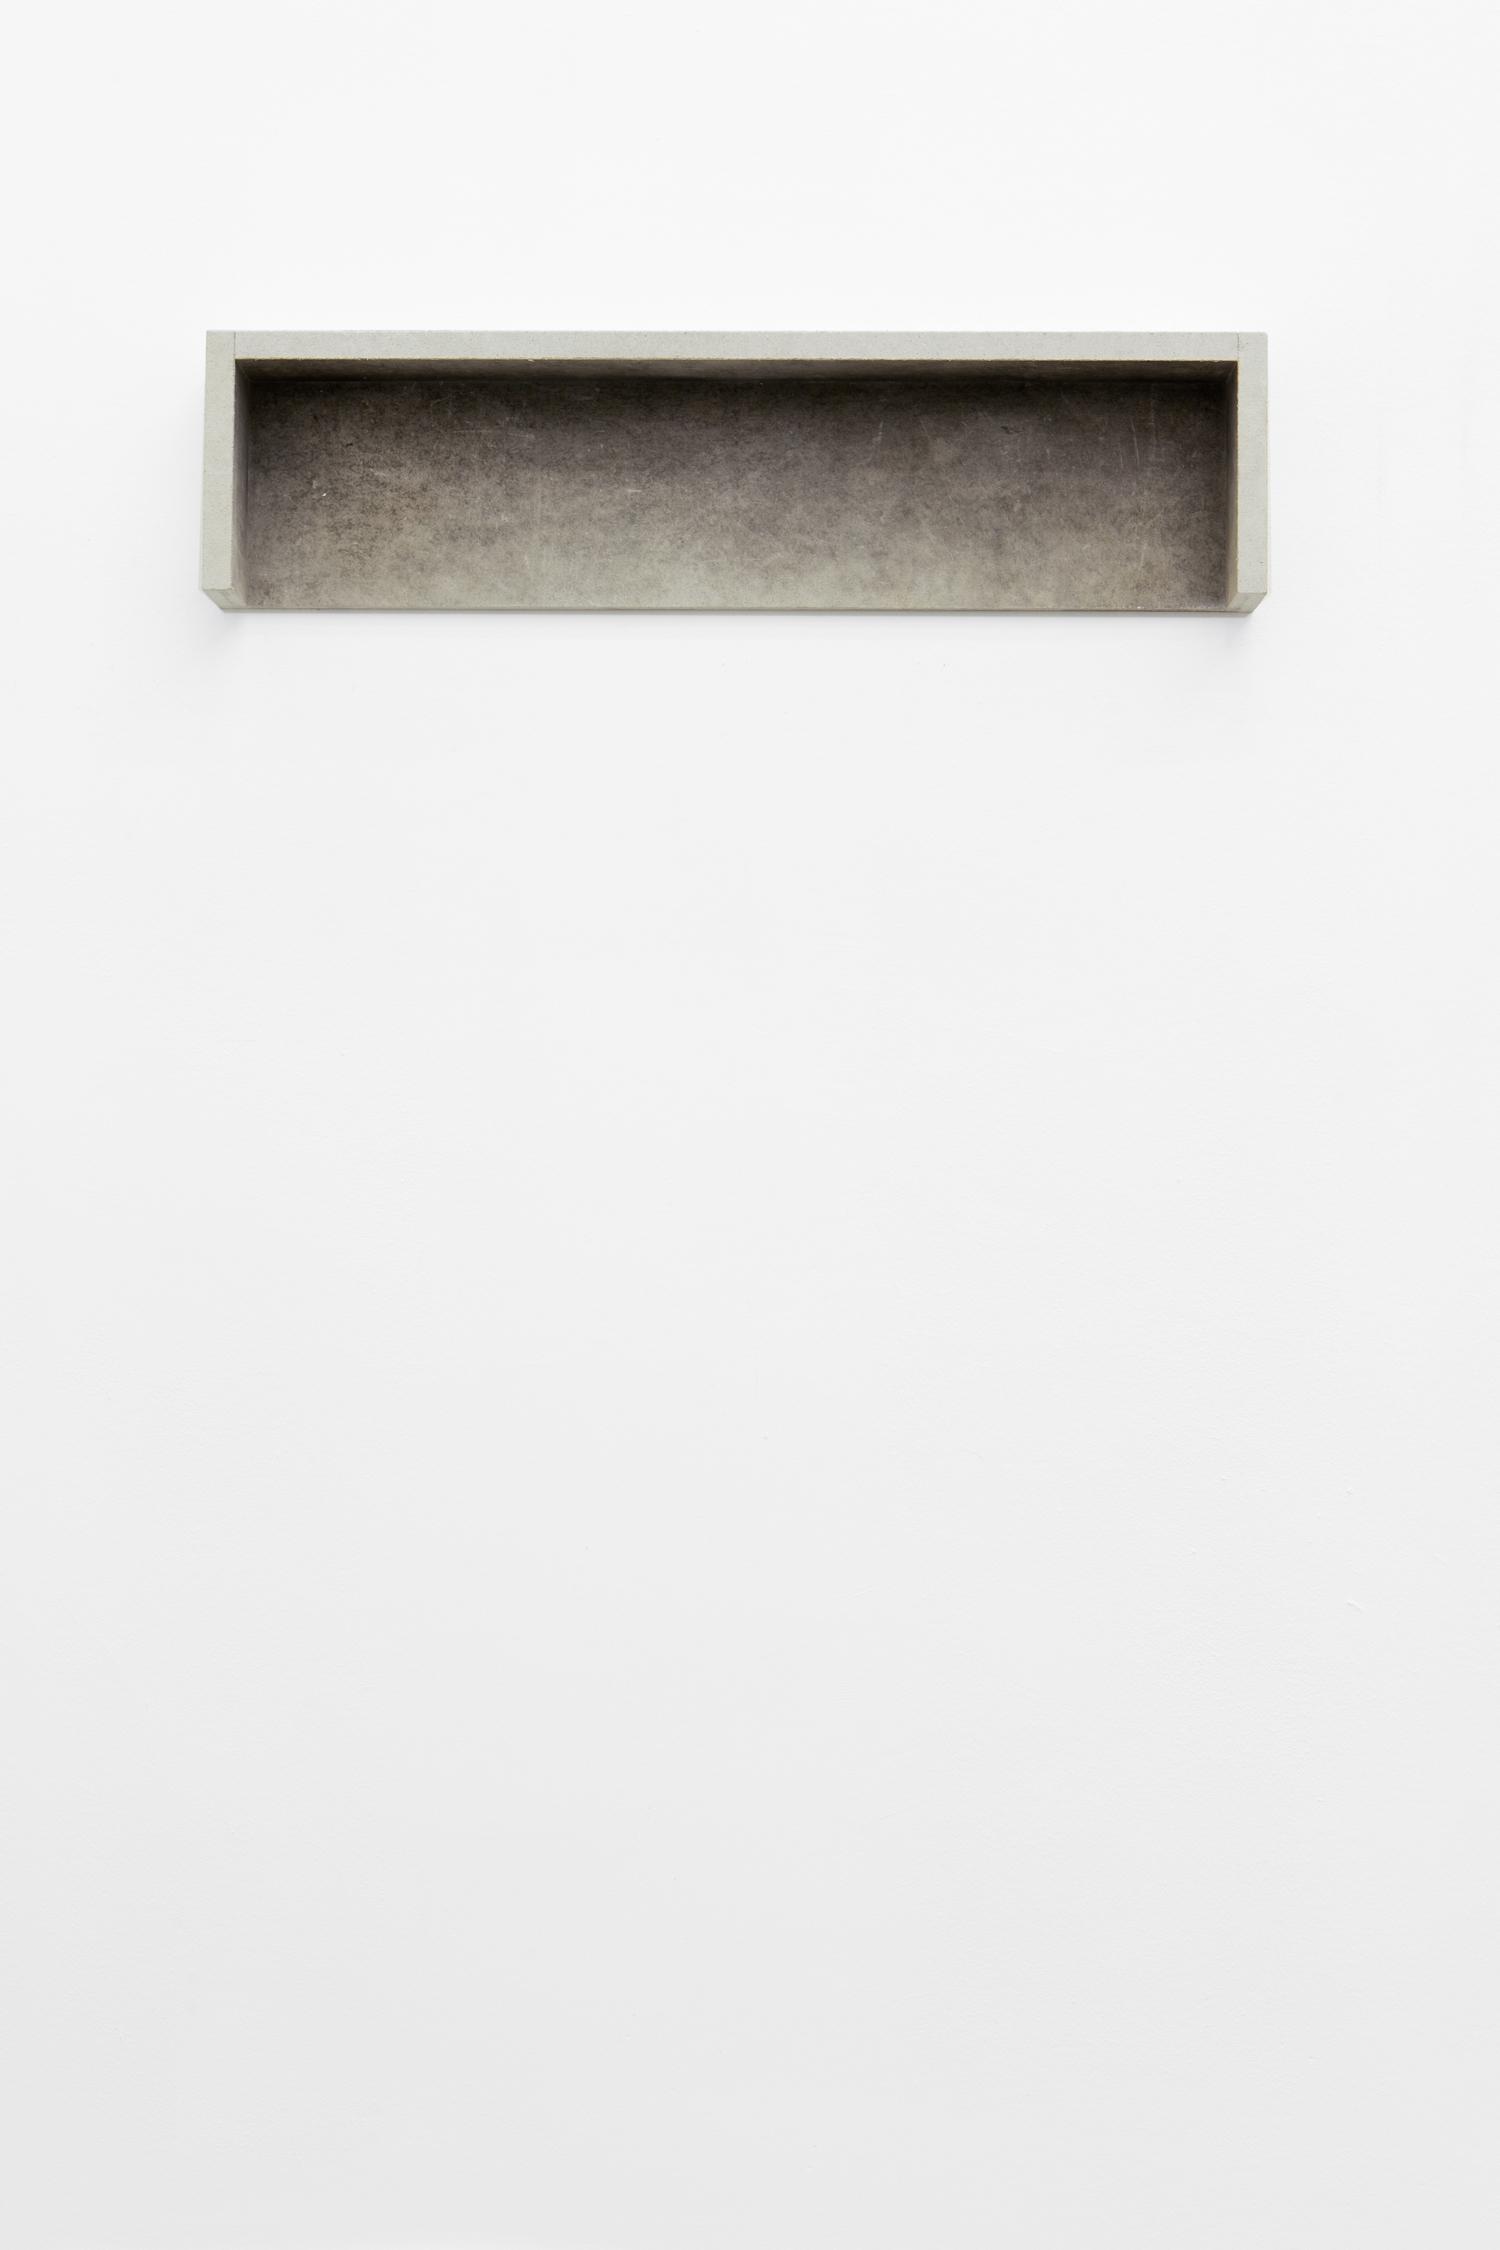 Untitled 2016 Anita Leisz  Gypsum fibreboard, 26.5 x 110 x 11 cm Courtesy of the artist and Meyer Kainer, Vienna   Photo: Tina Herzl